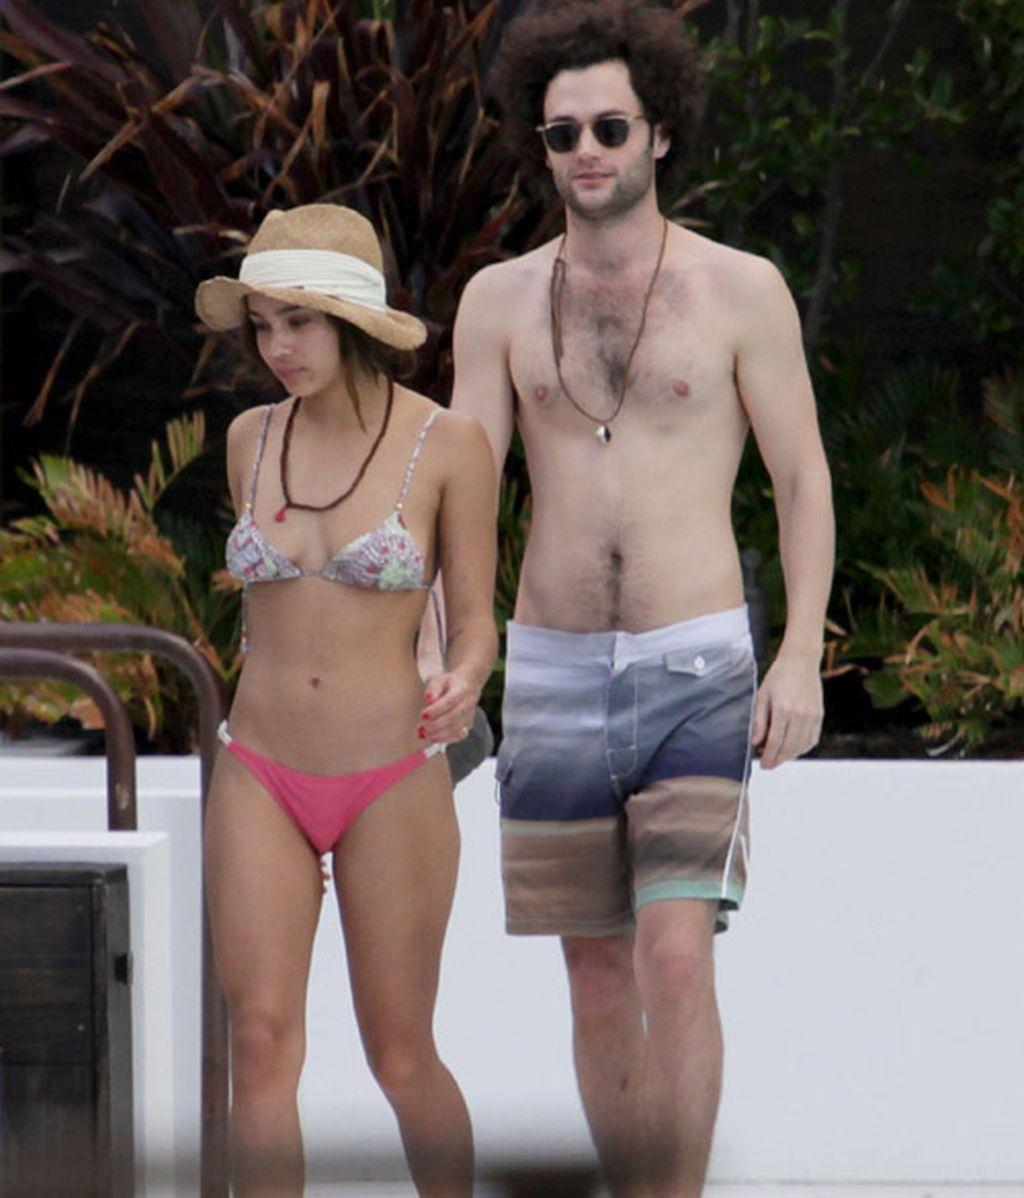 Penn Badgley (Dan en Gossip Girl) con Zoe Kravitz de cócteles y playa